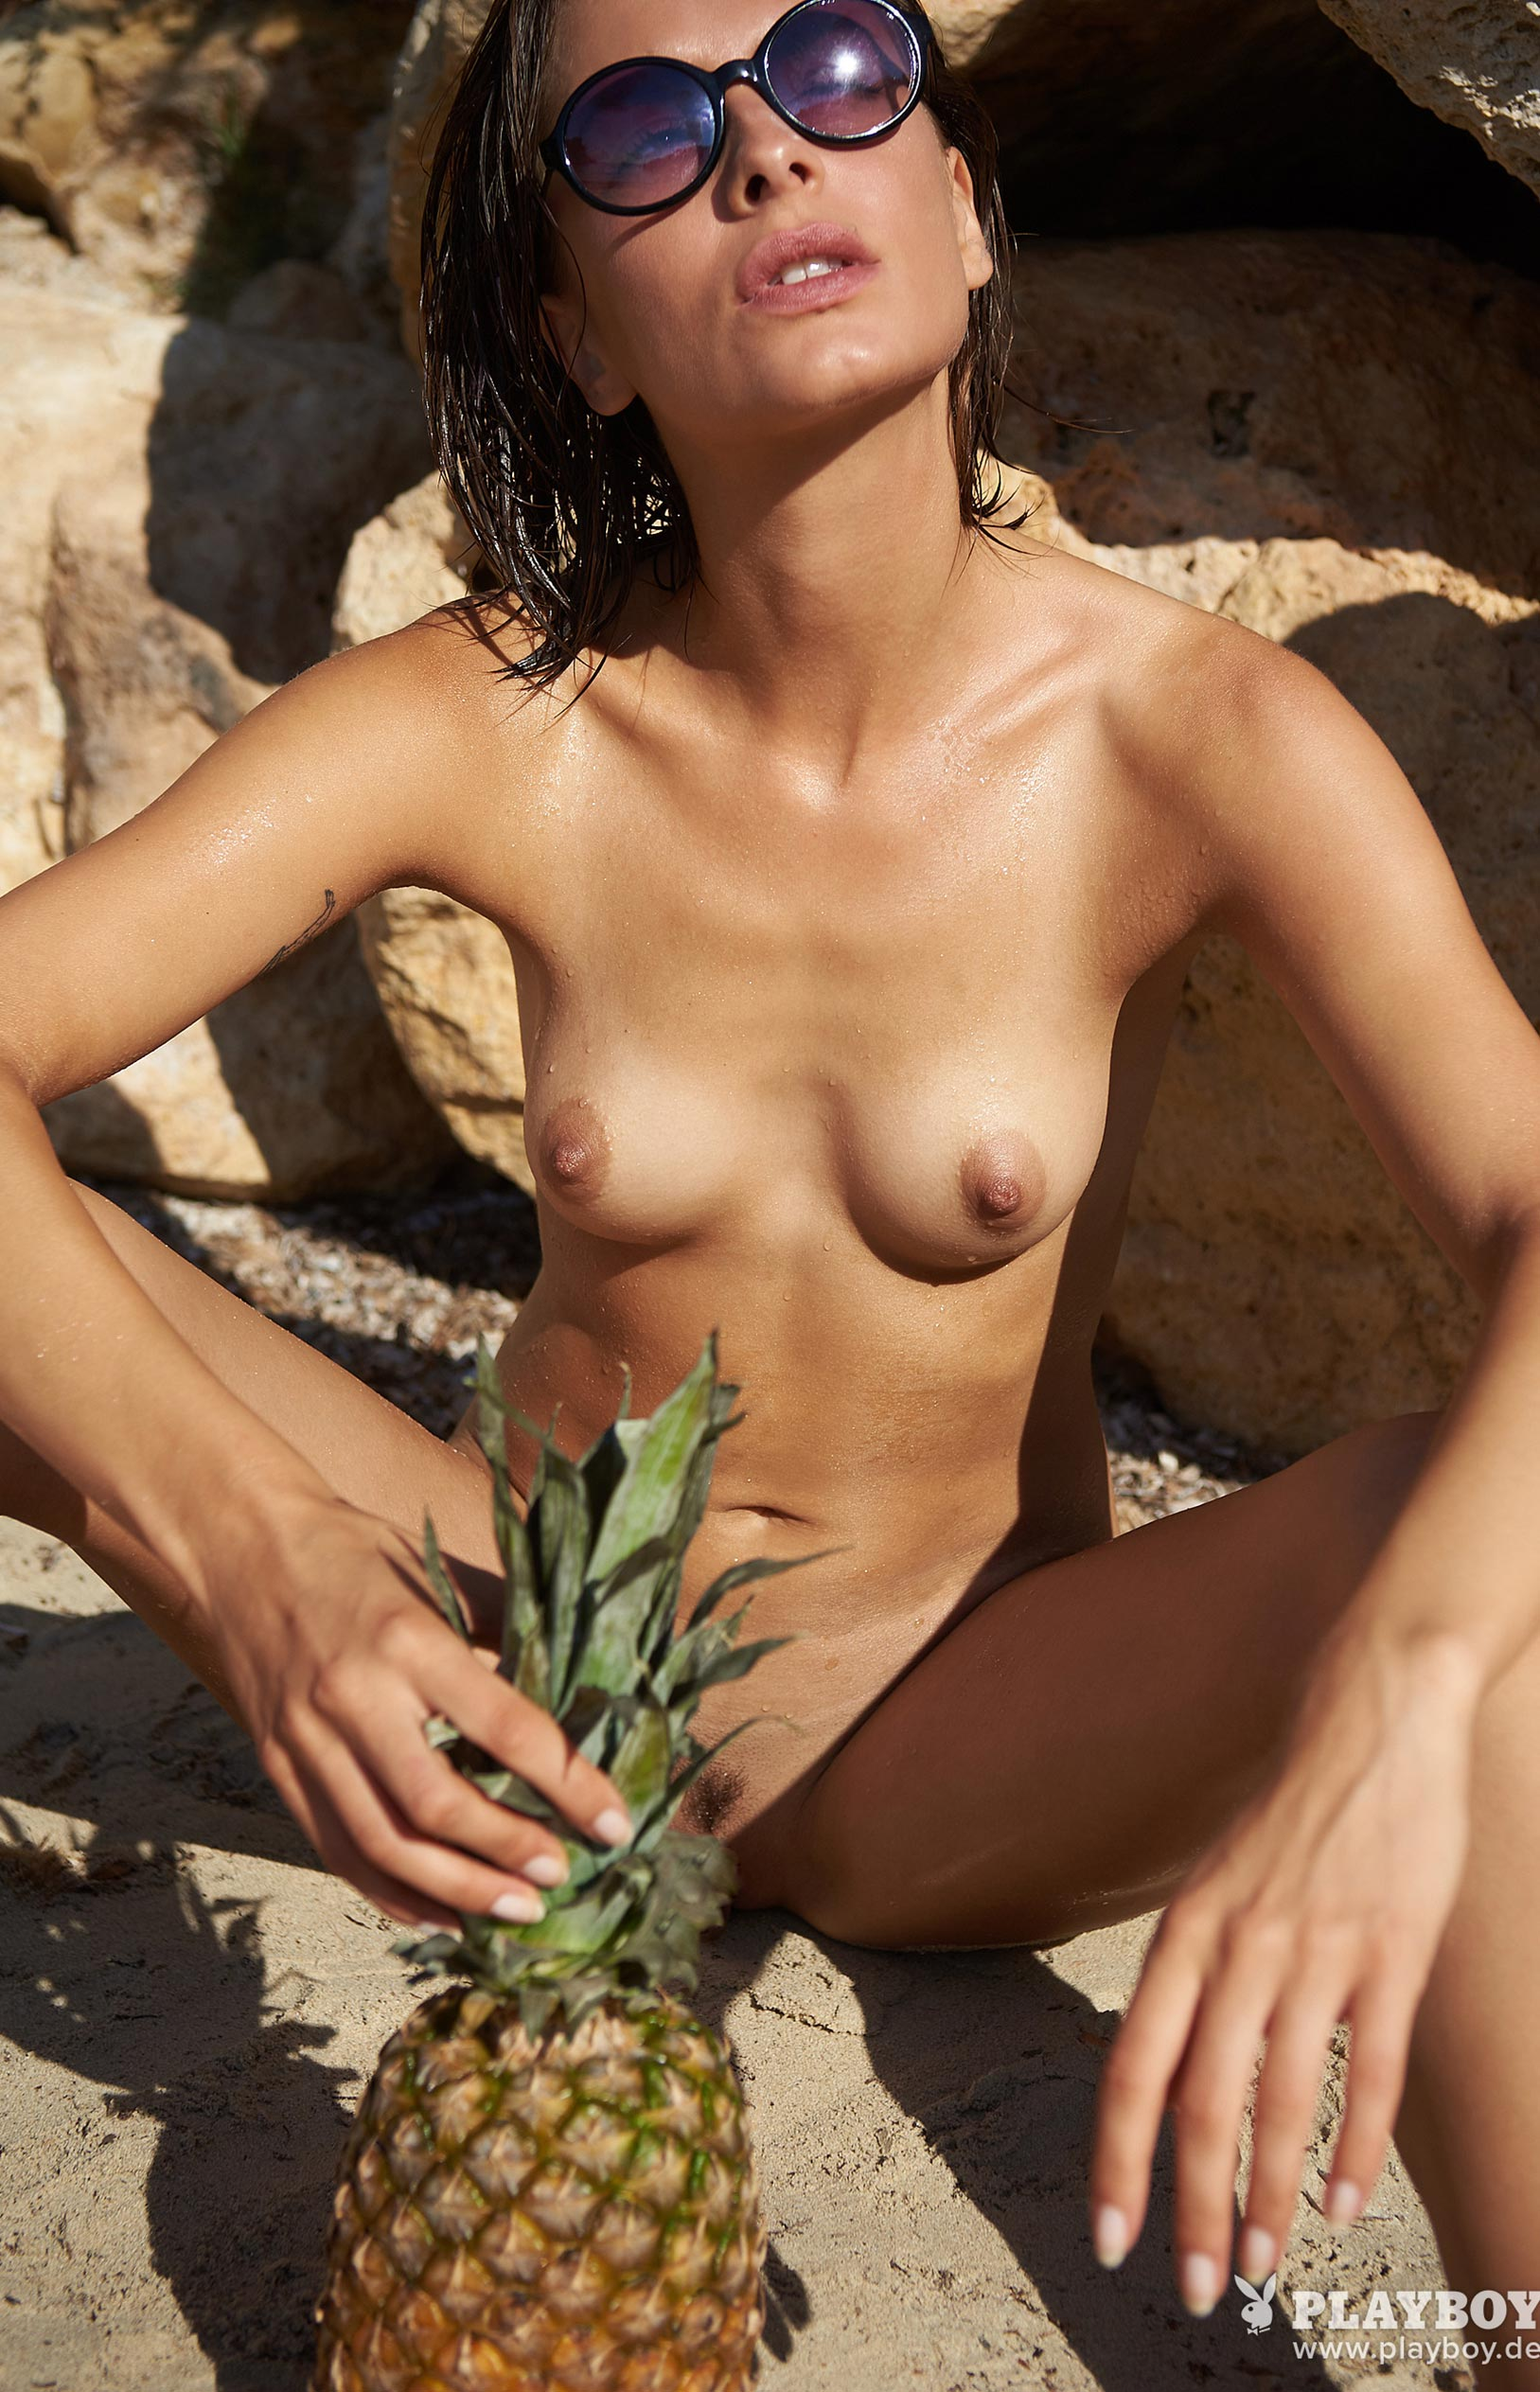 Оливия Пельцер - Девушка месяца Playboy Германия, сентябрь 2018 / фото 15